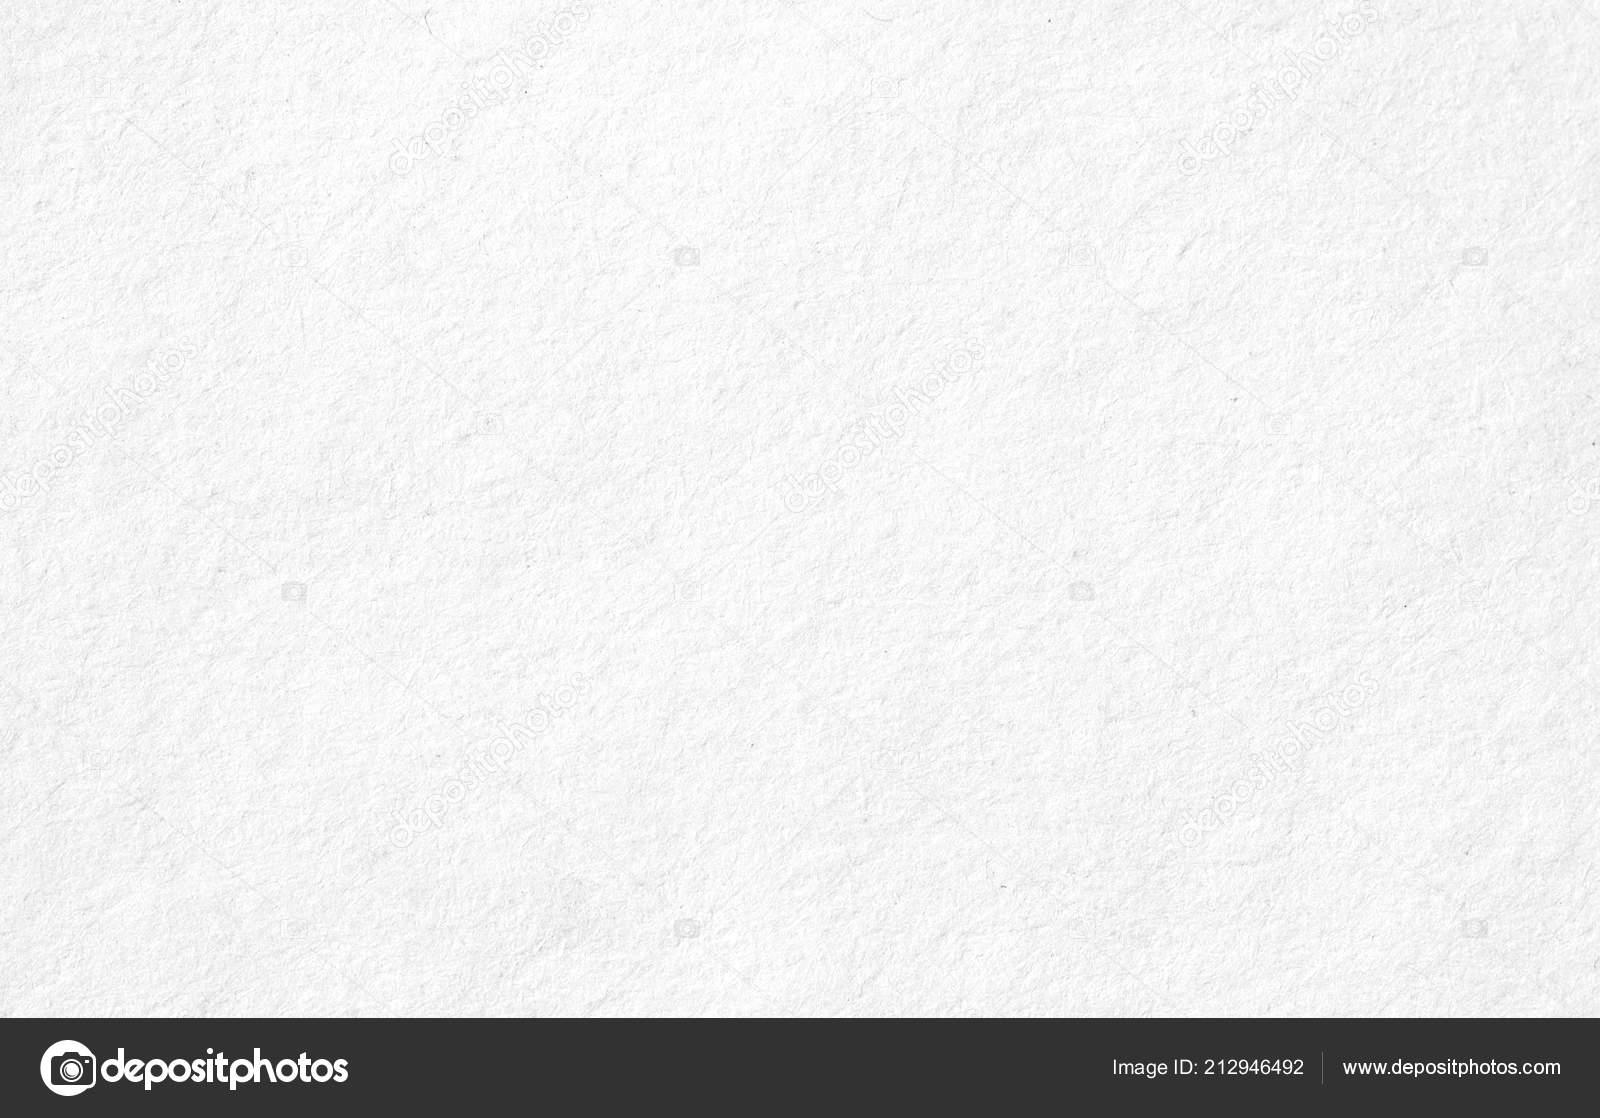 Abstract Background Design Background Blank Close Design Blank Gray Grunge Stock Photo C Vamariyav 212946492